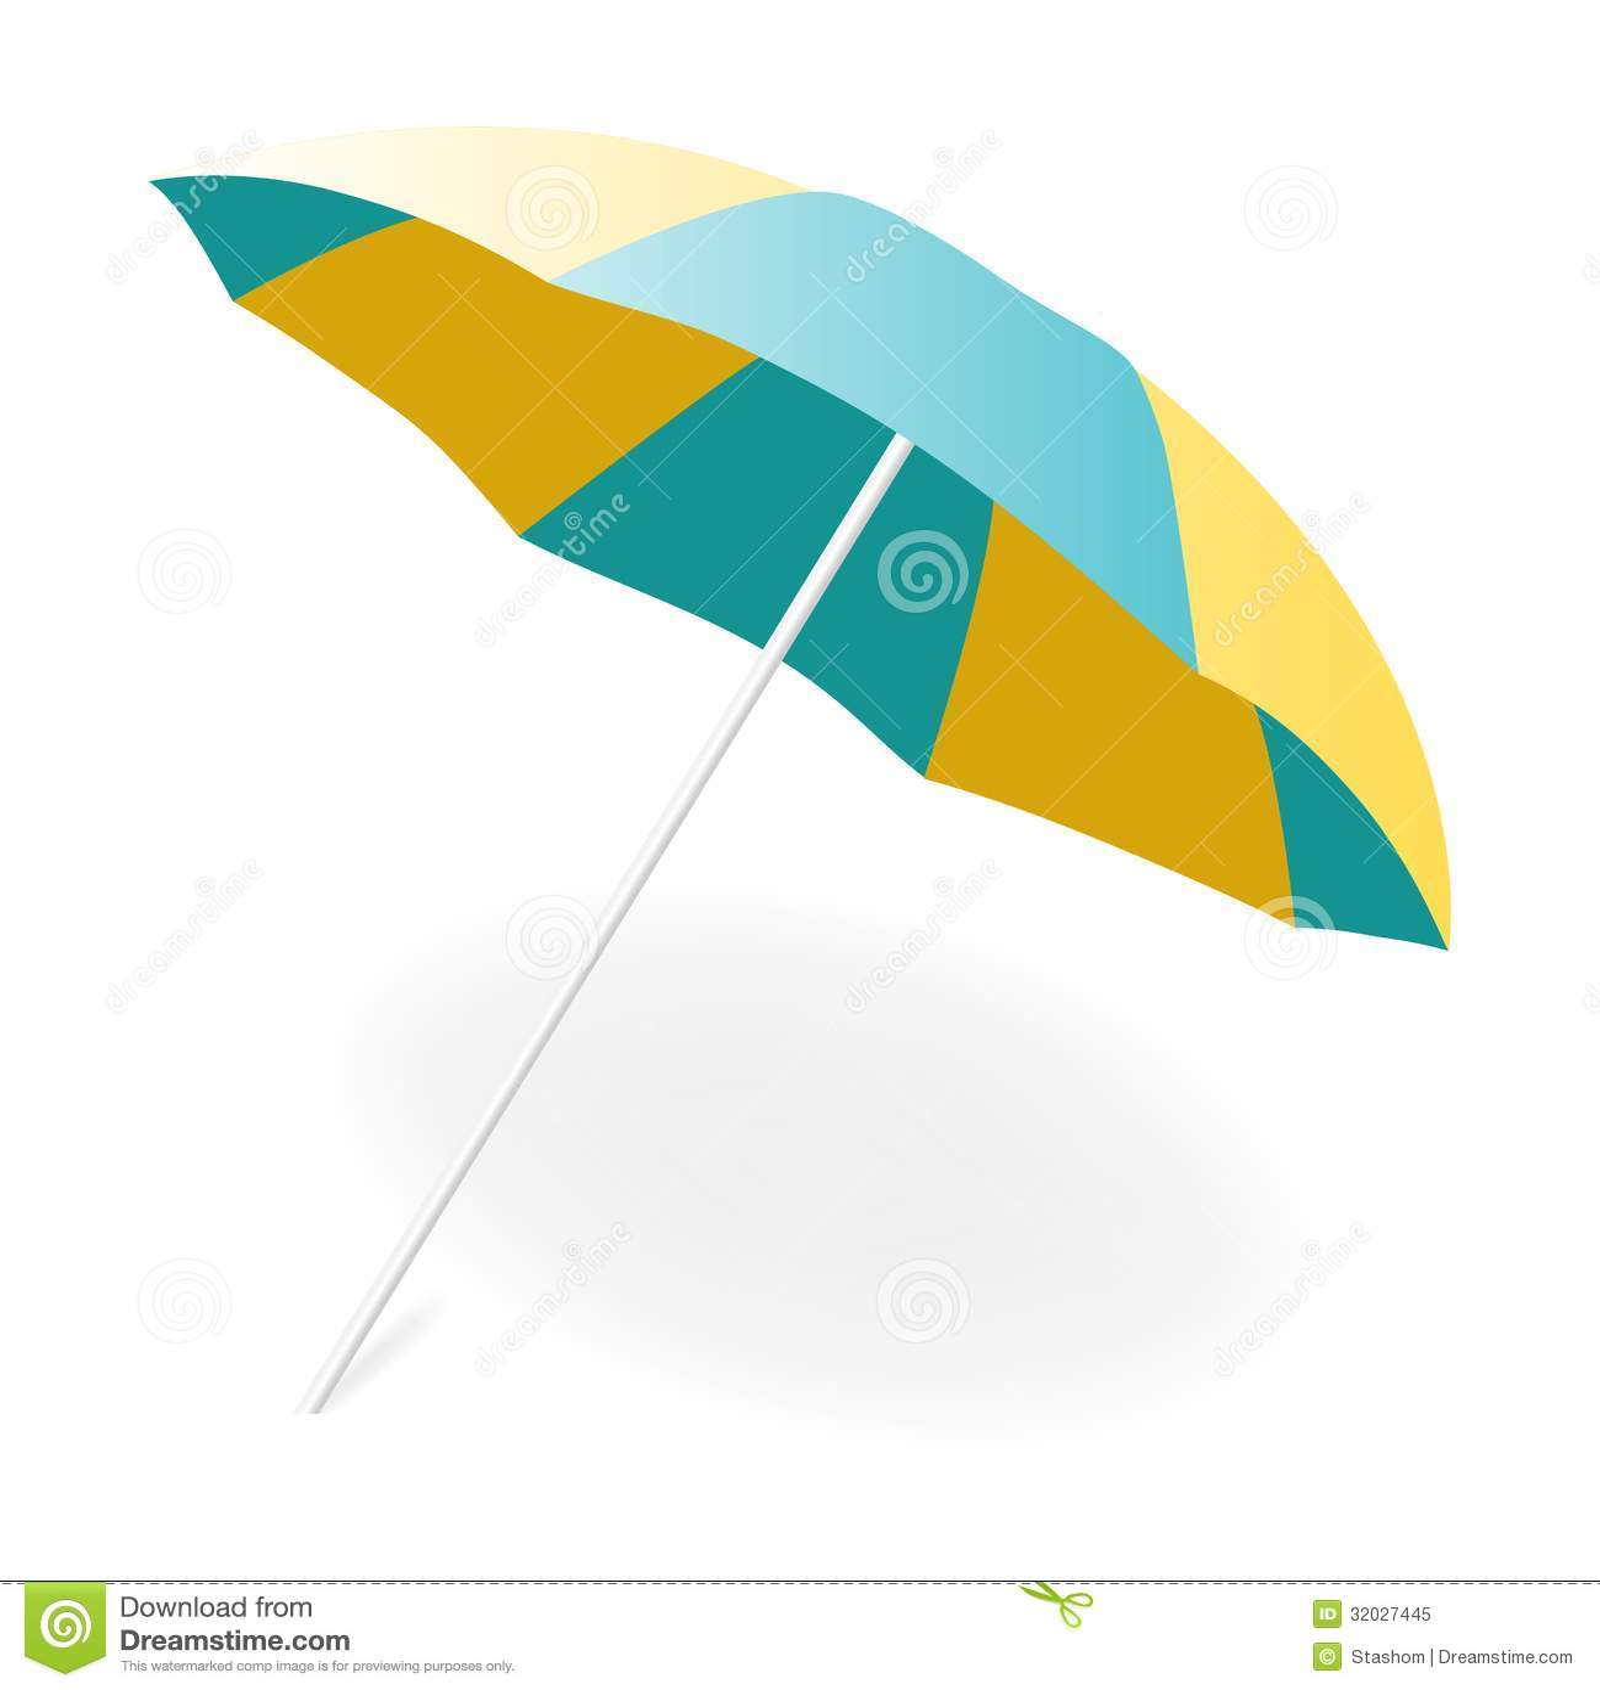 Beach chair with umbrella painting - Beach Umbrella Vector Illustration Royalty Free Stock